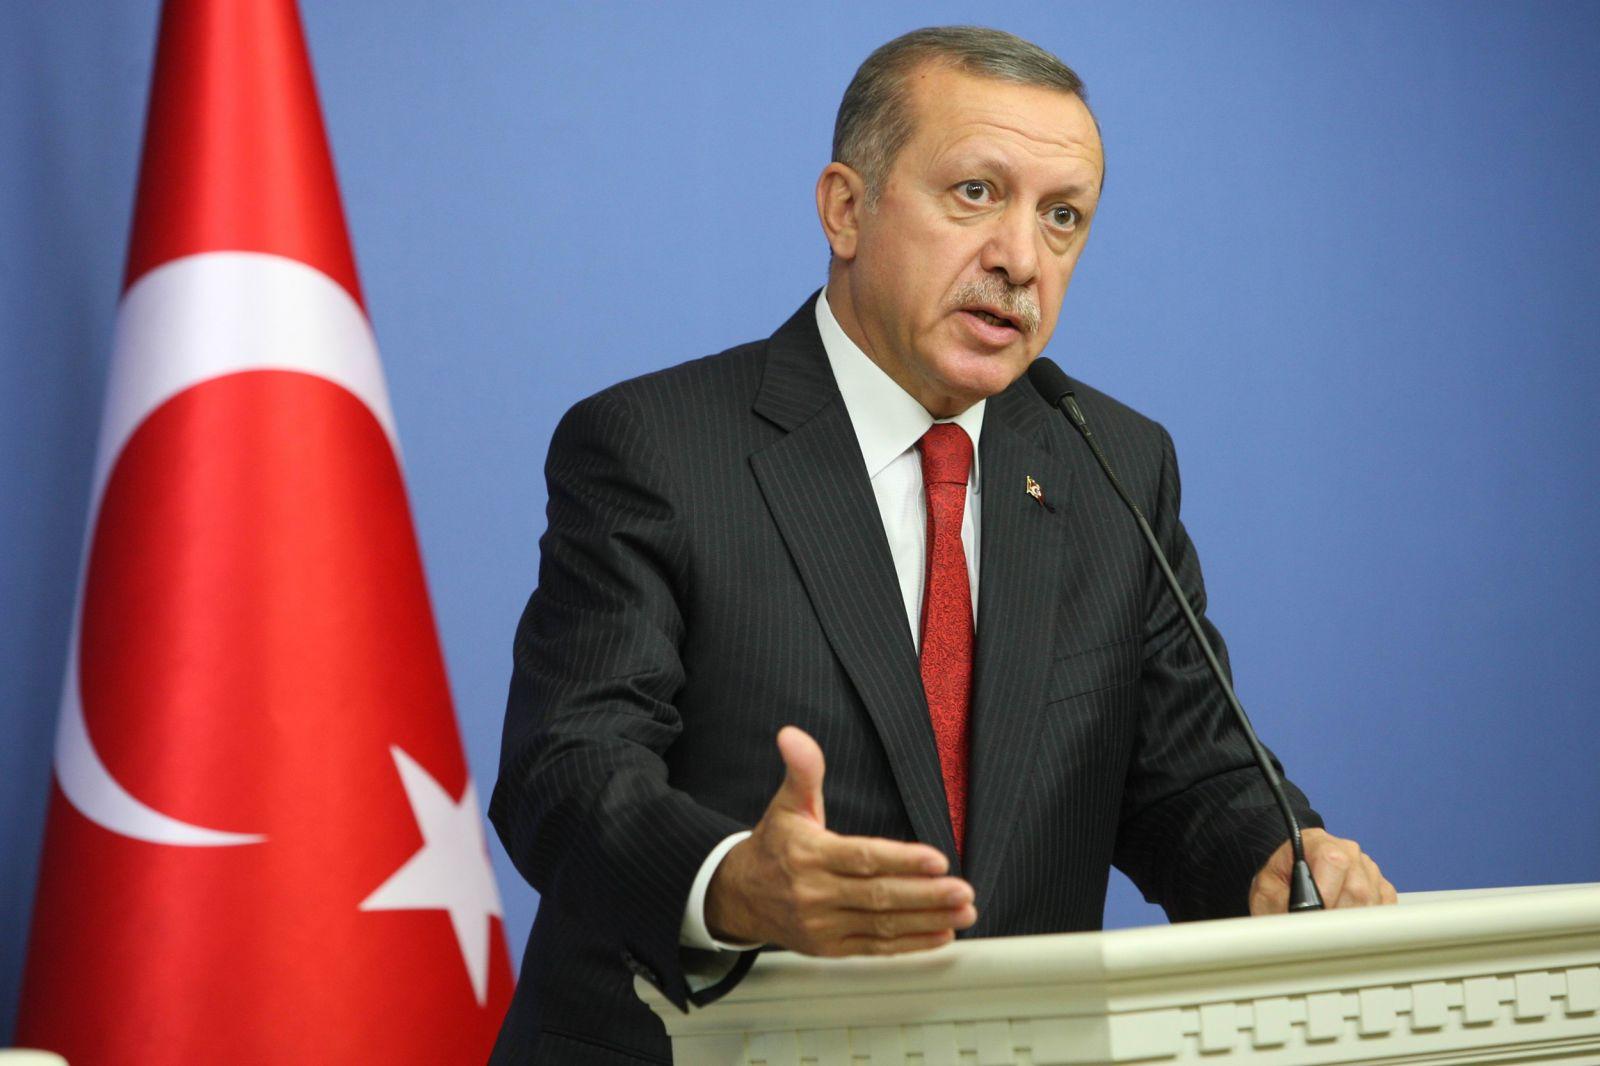 Syria's Assad says Turkish leader backs extremism